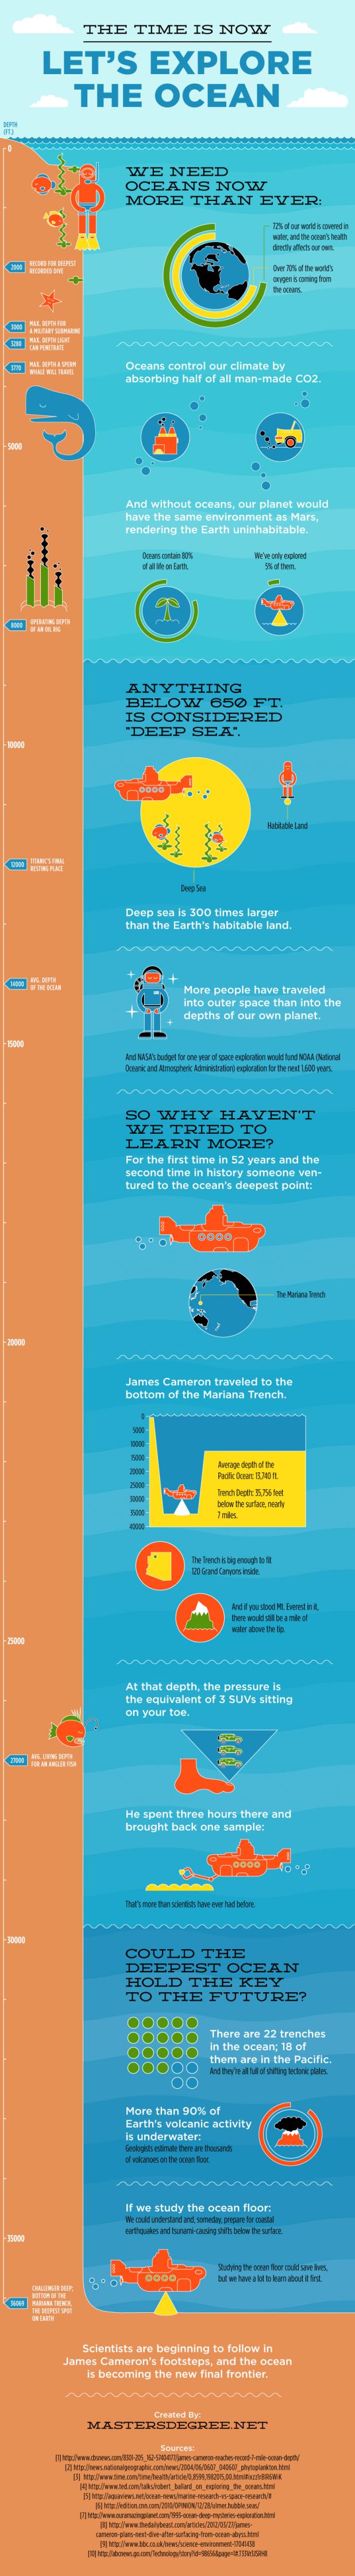 infographic exploring the ocean